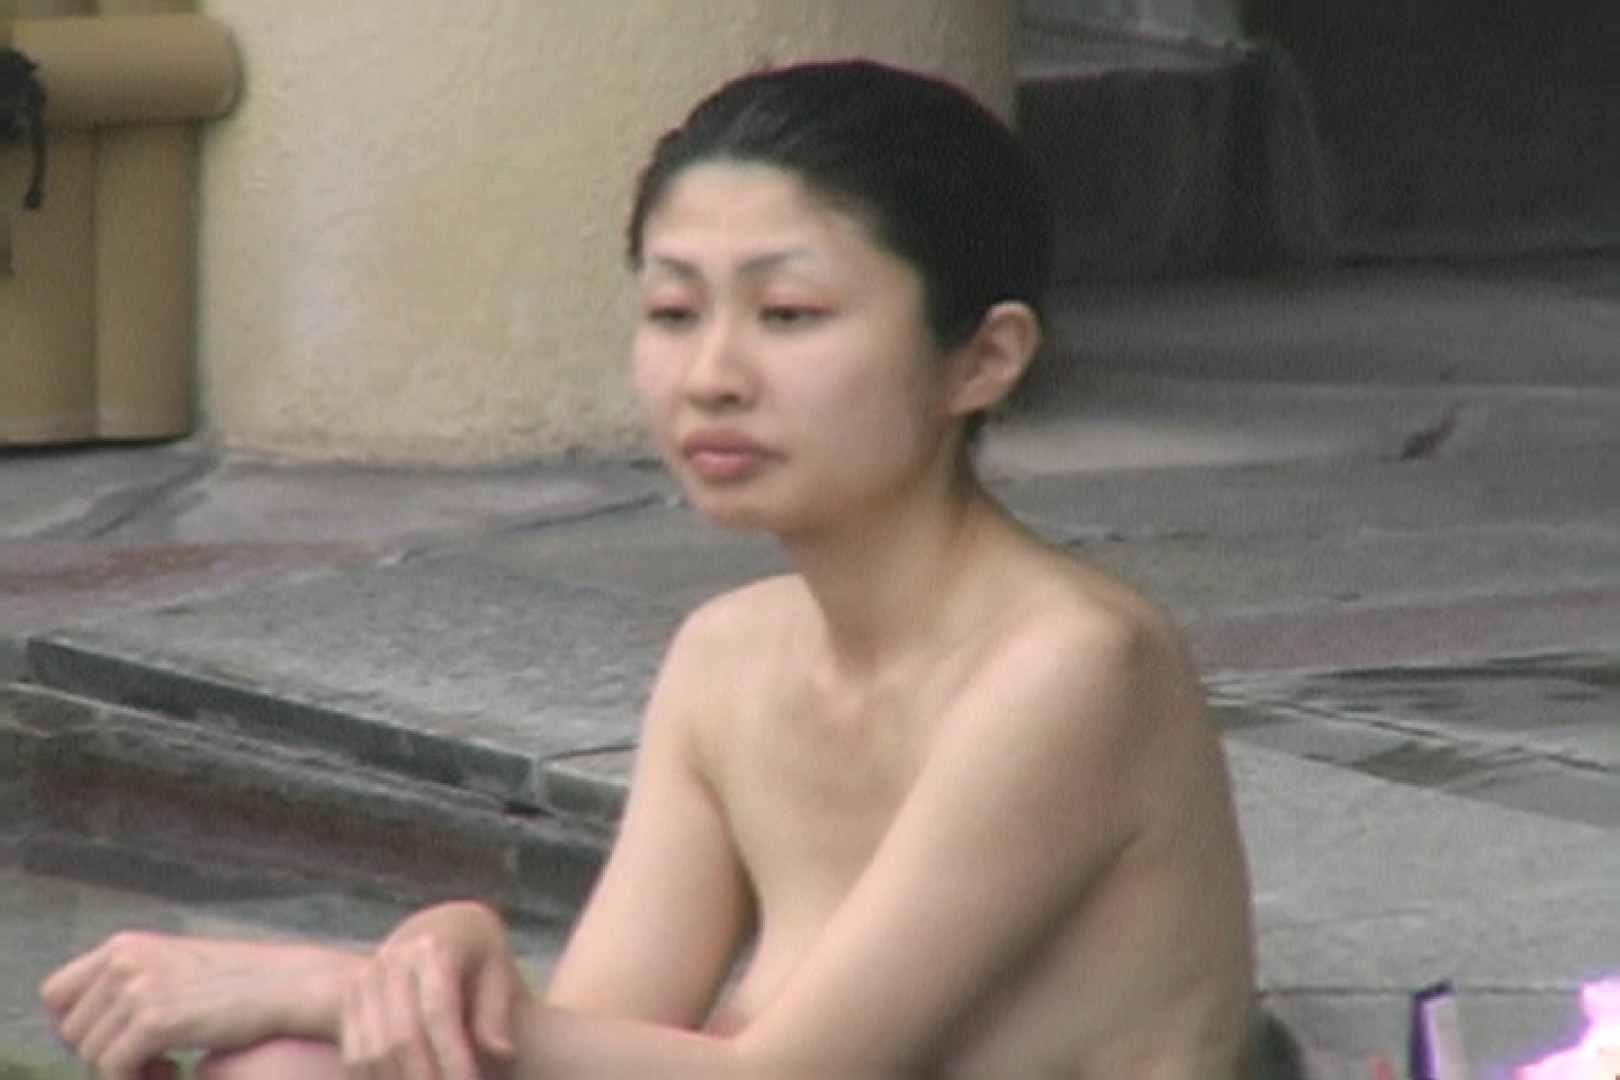 Aquaな露天風呂Vol.642 盗撮シリーズ   露天風呂編  92PIX 39